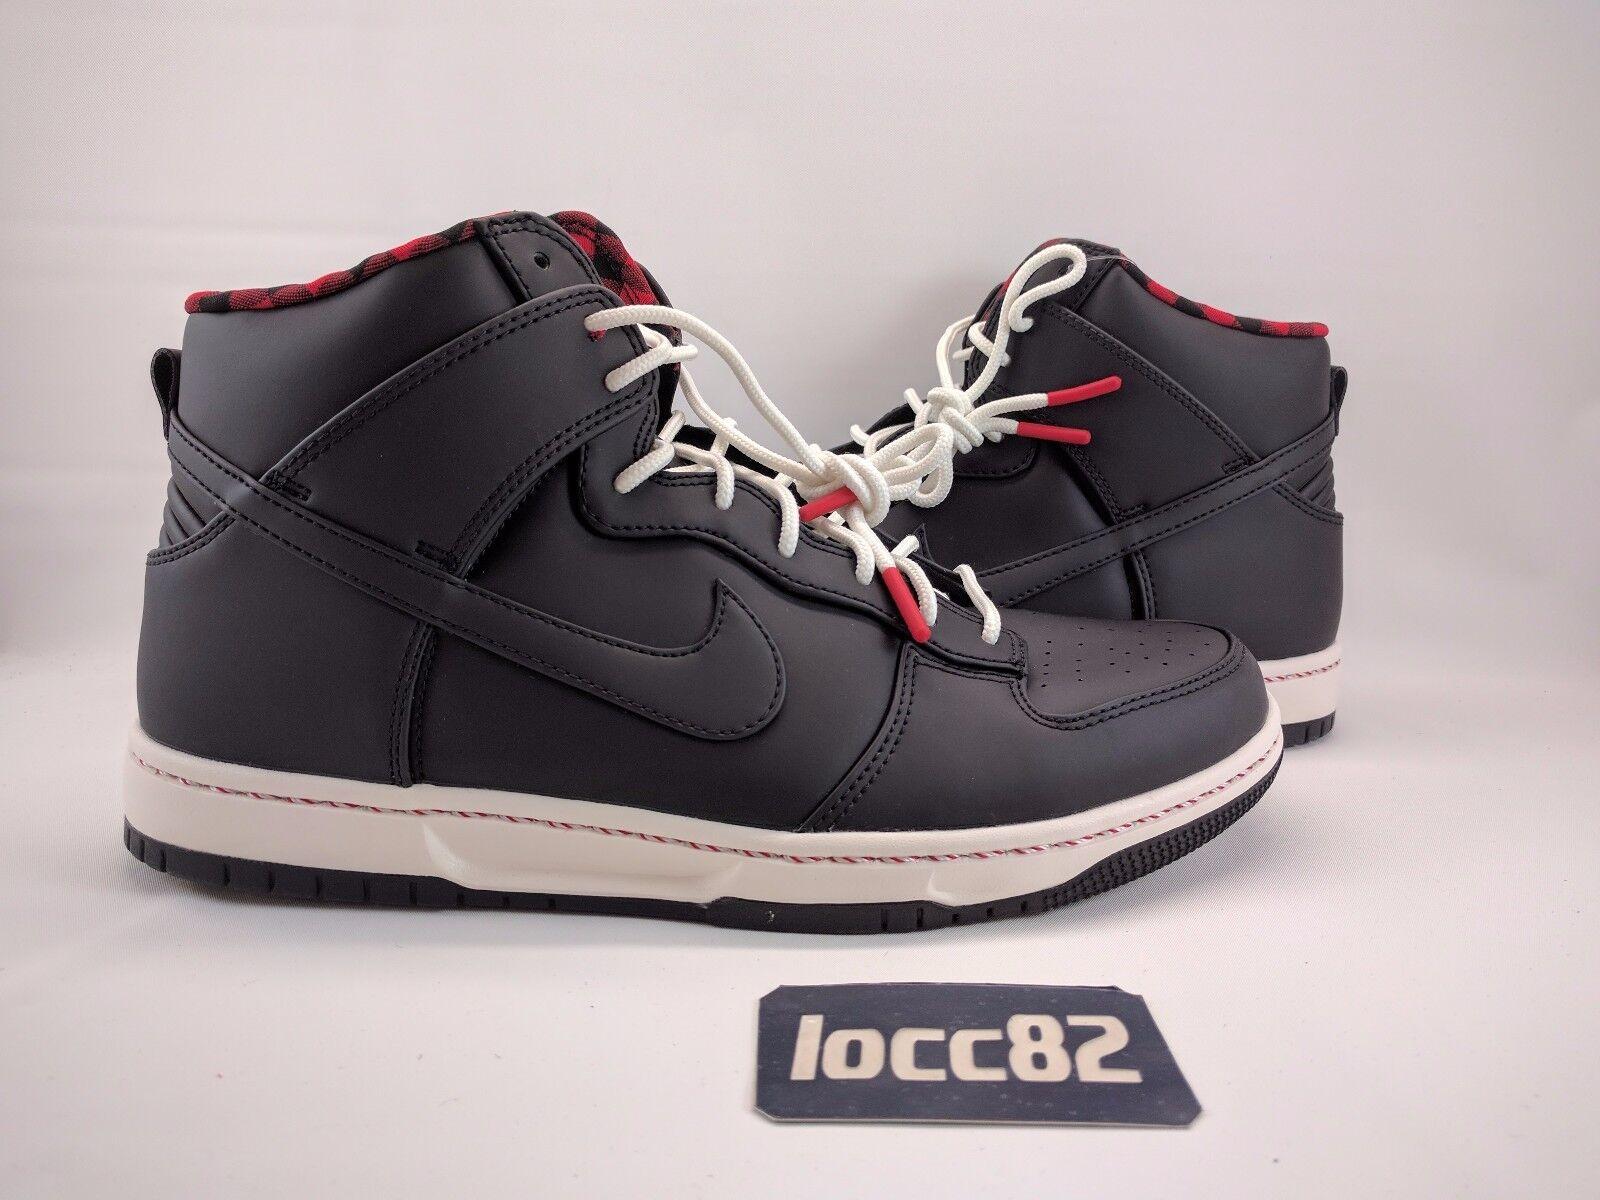 best-selling model of the brand Nike Dunk Hi Ultra Price reduction rain limited black umbrella 7 8 9.5 10.5